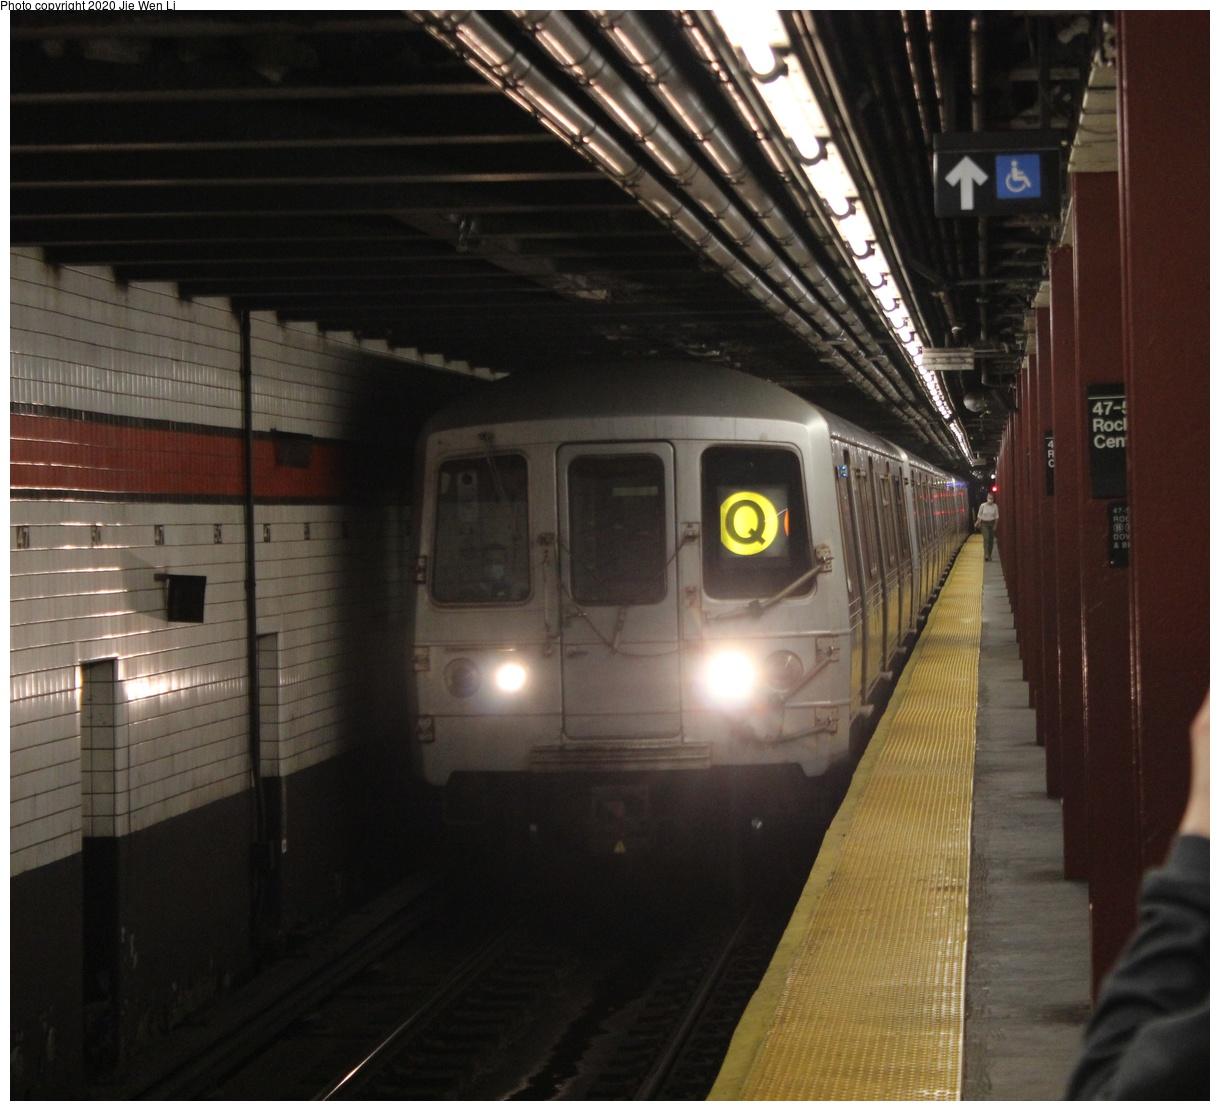 (408k, 1220x1111)<br><b>Country:</b> United States<br><b>City:</b> New York<br><b>System:</b> New York City Transit<br><b>Line:</b> IND 6th Avenue Line<br><b>Location:</b> 47-50th Street/Rockefeller Center<br><b>Route:</b> Q<br><b>Car:</b> R-46 (Pullman-Standard, 1974-75) 5826 <br><b>Photo by:</b> Jie Wen Li<br><b>Date:</b> 7/18/2020<br><b>Notes:</b> Q reroute via 6th Ave.<br><b>Viewed (this week/total):</b> 0 / 194